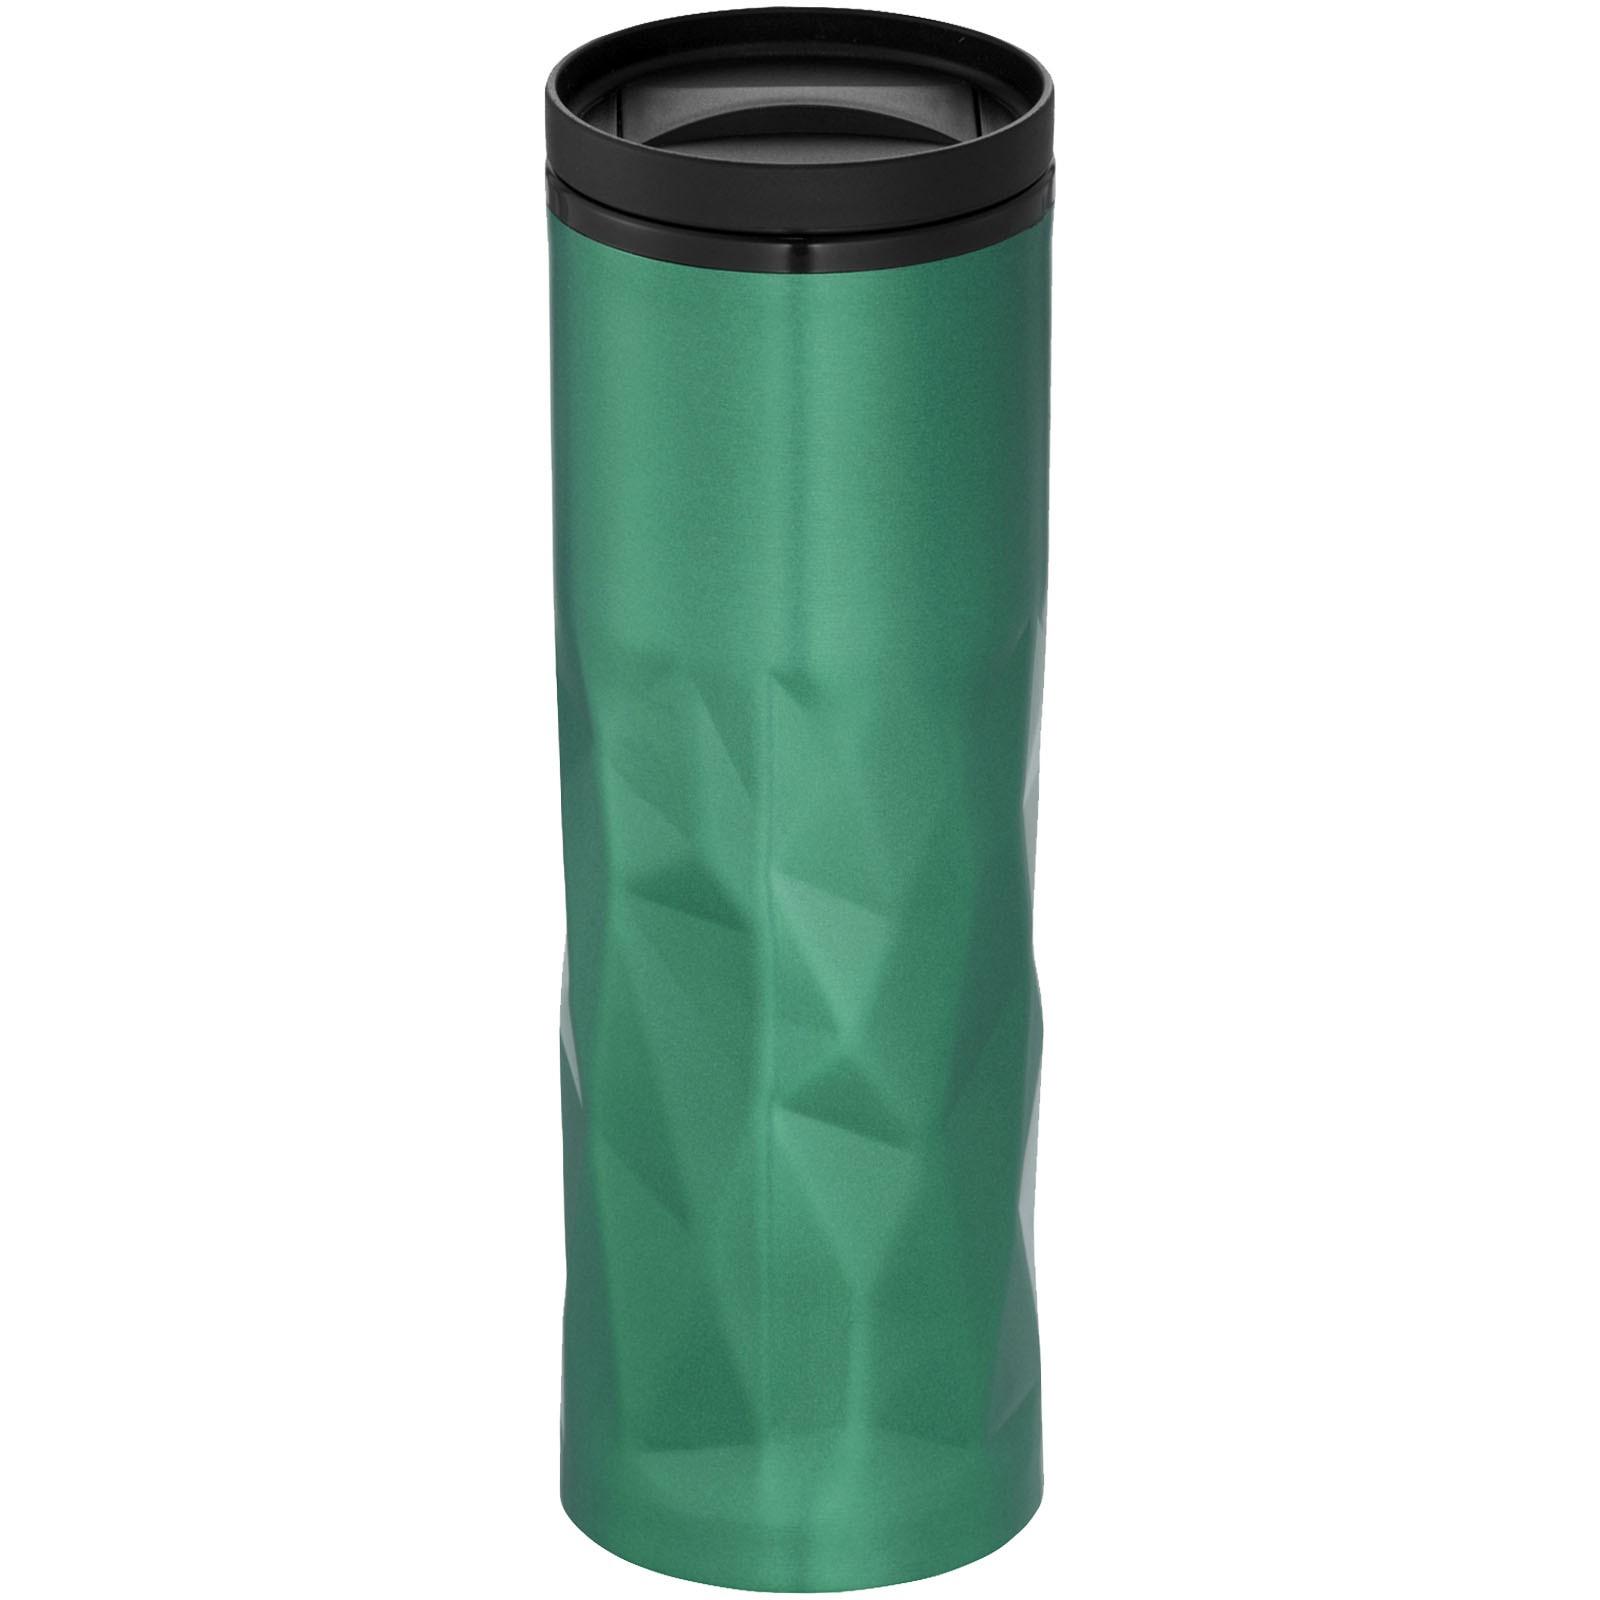 Torino 450 ml foam insulated tumbler - Green